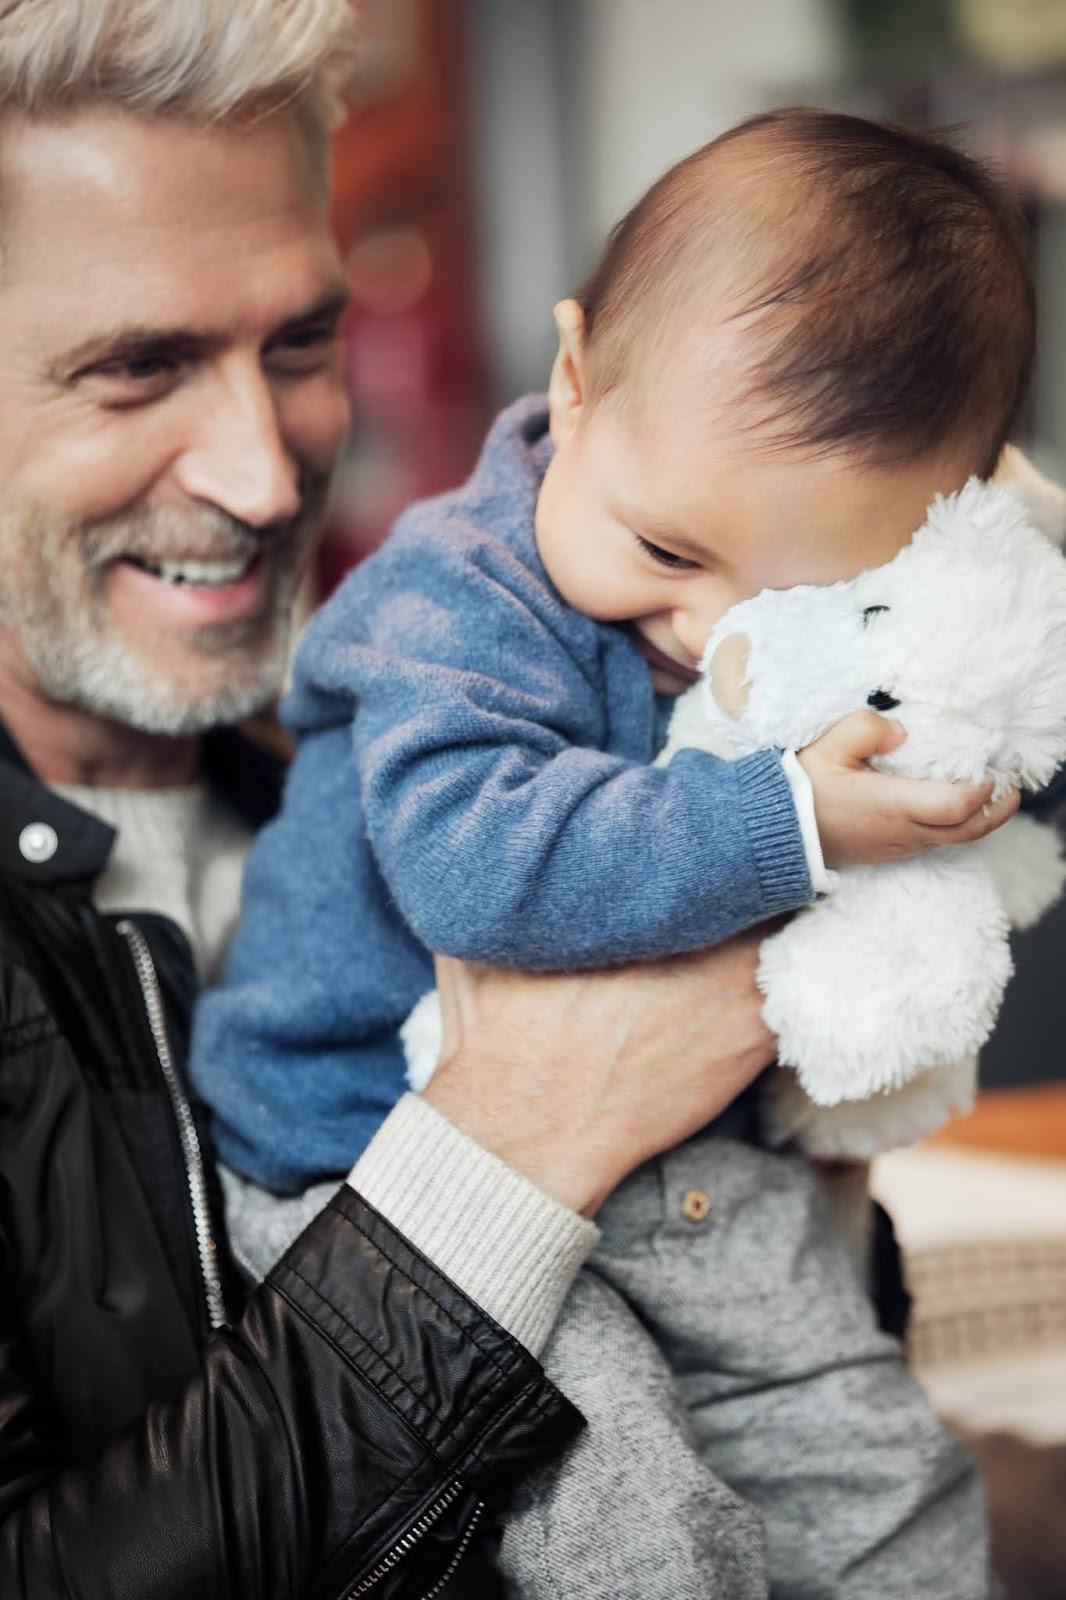 280276 Families at Volvo Cars Volvo Family Bond : Γονική άδεια 24 εβδομάδων με αποδοχές, για όλους Volvo, Volvo Cars, ειδήσεις